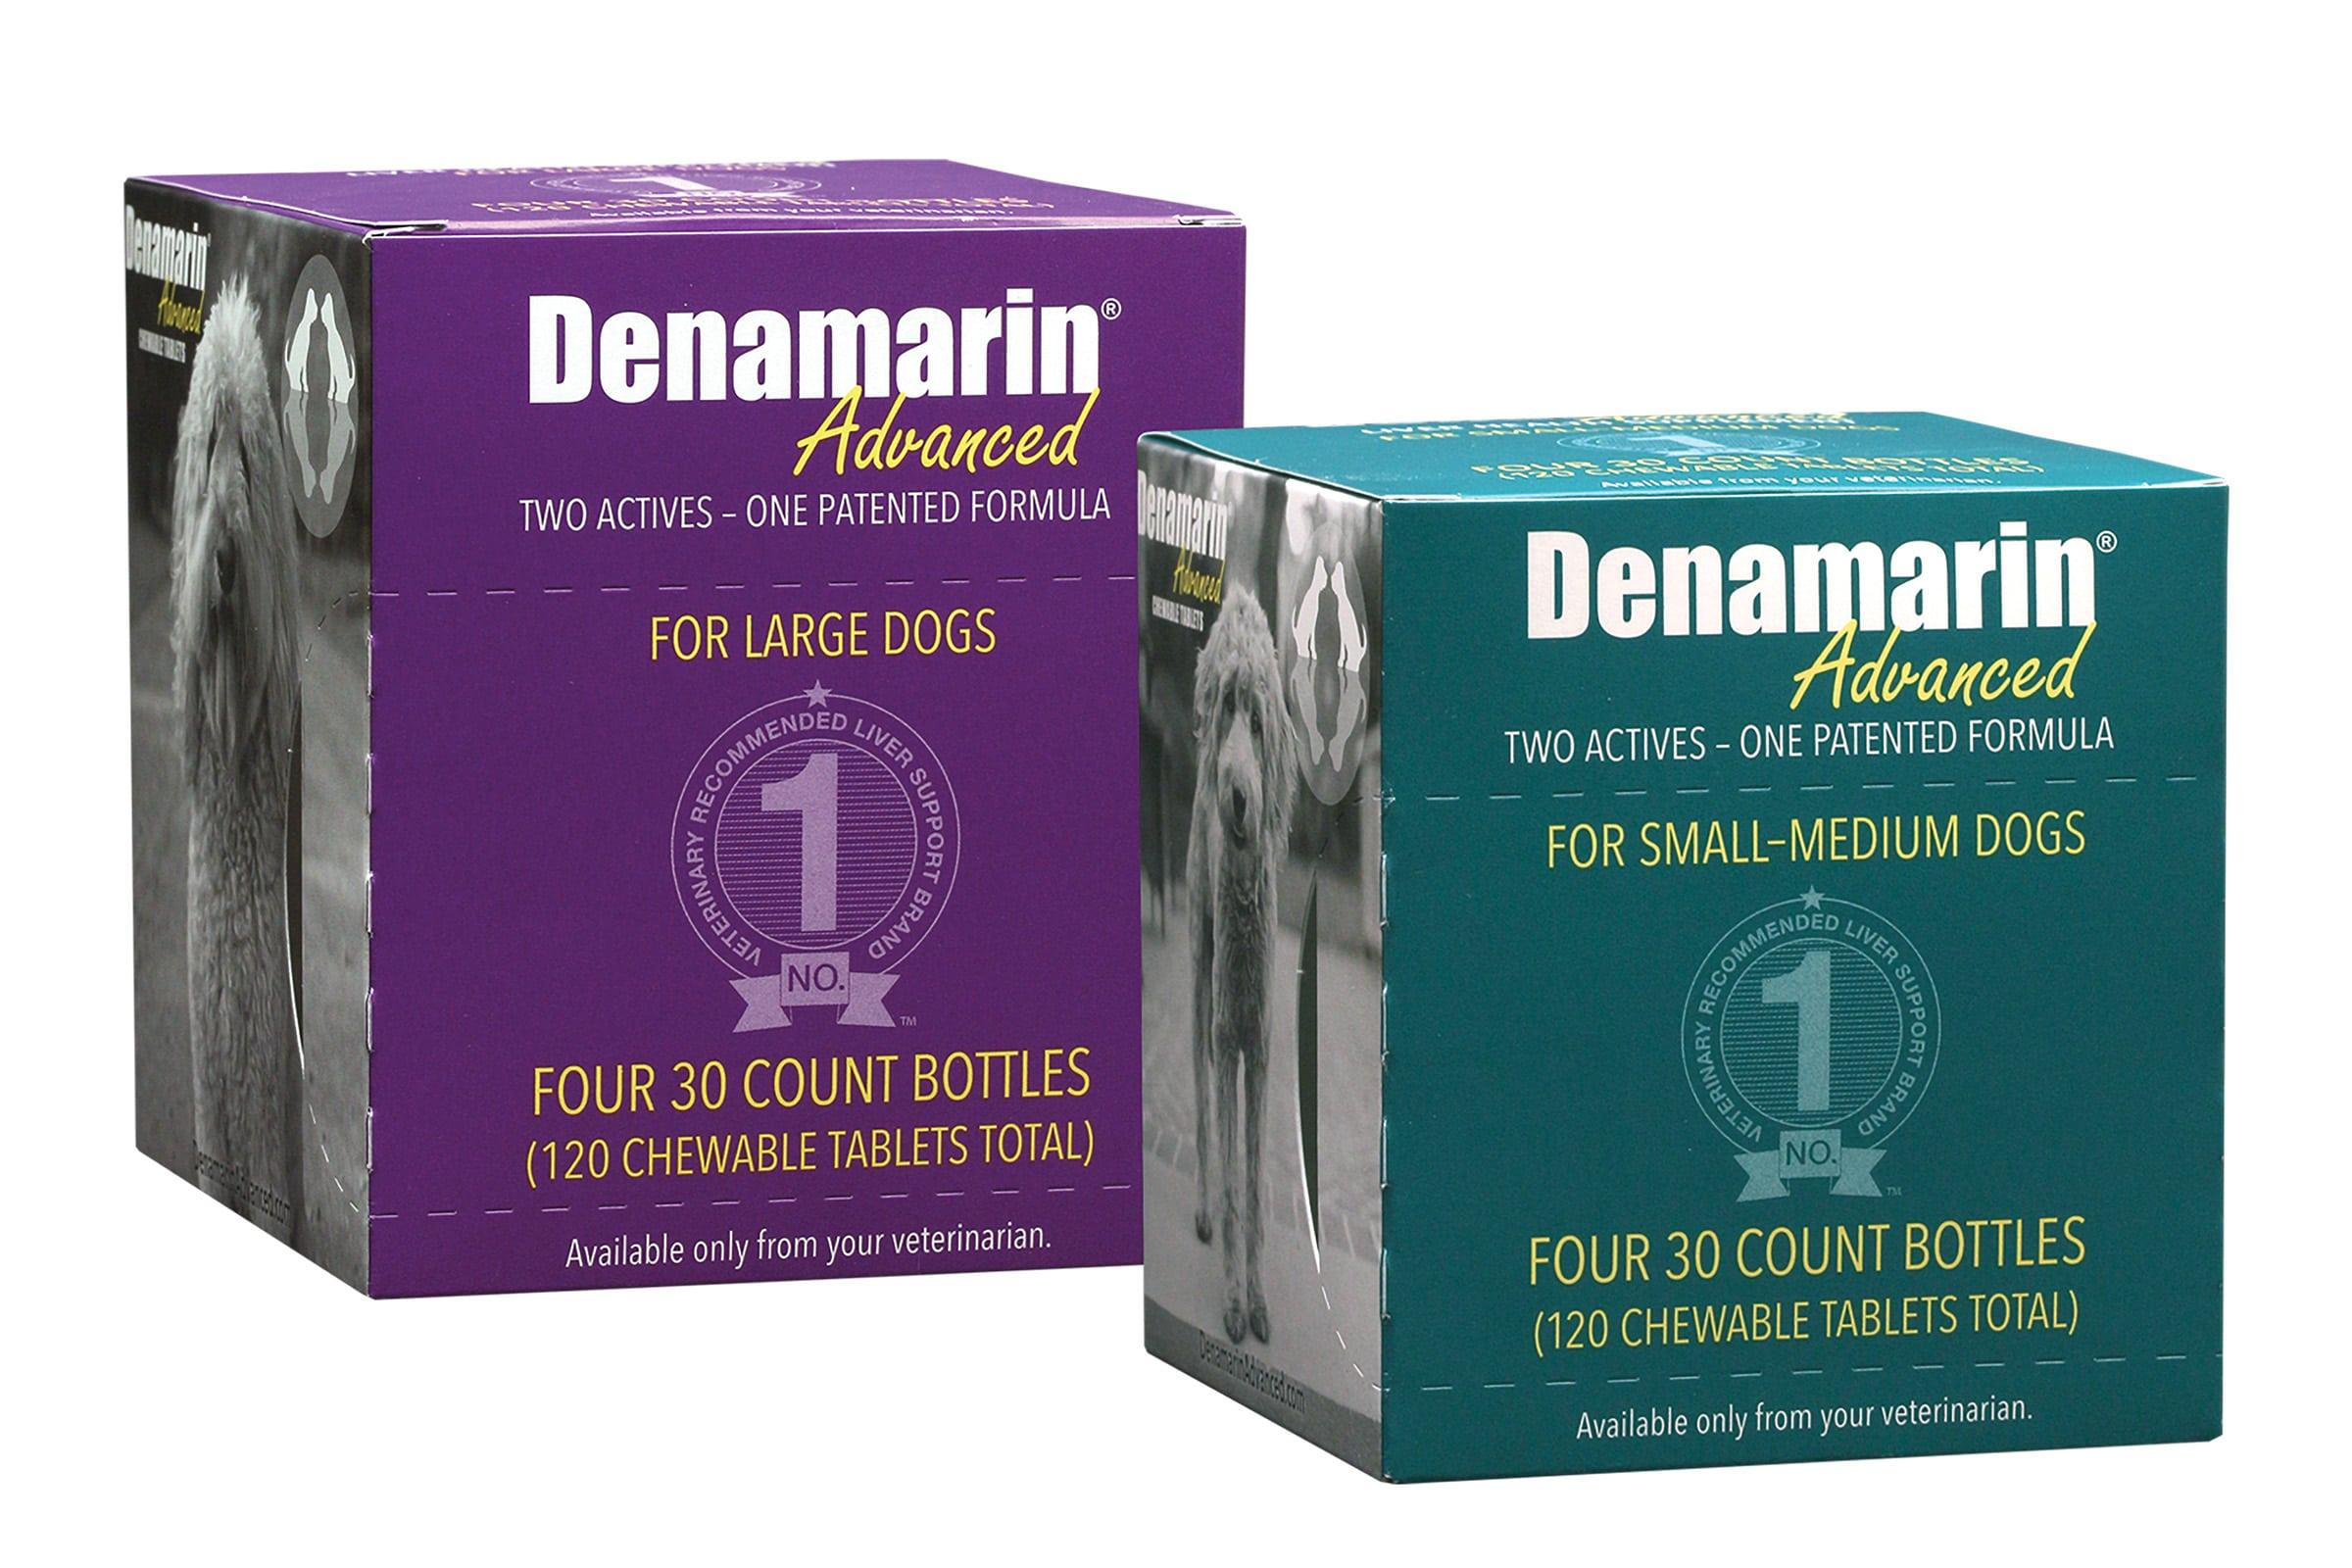 Denamarin Advanced limited to veterinary channel